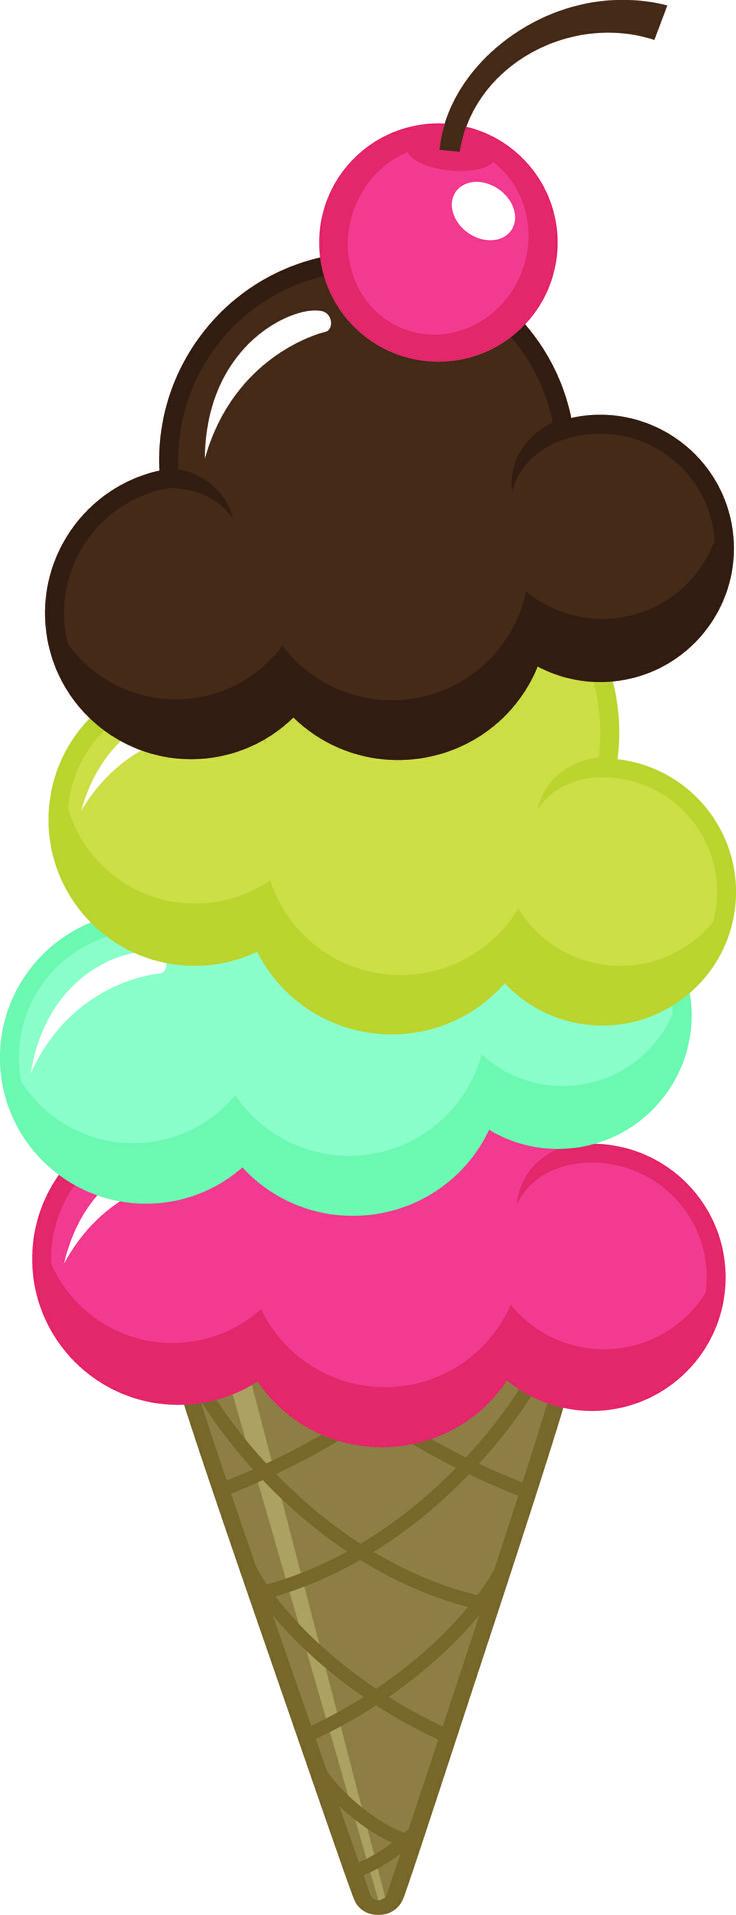 Ice cream  free ice cream clipart ideas on cute cartoon food 2